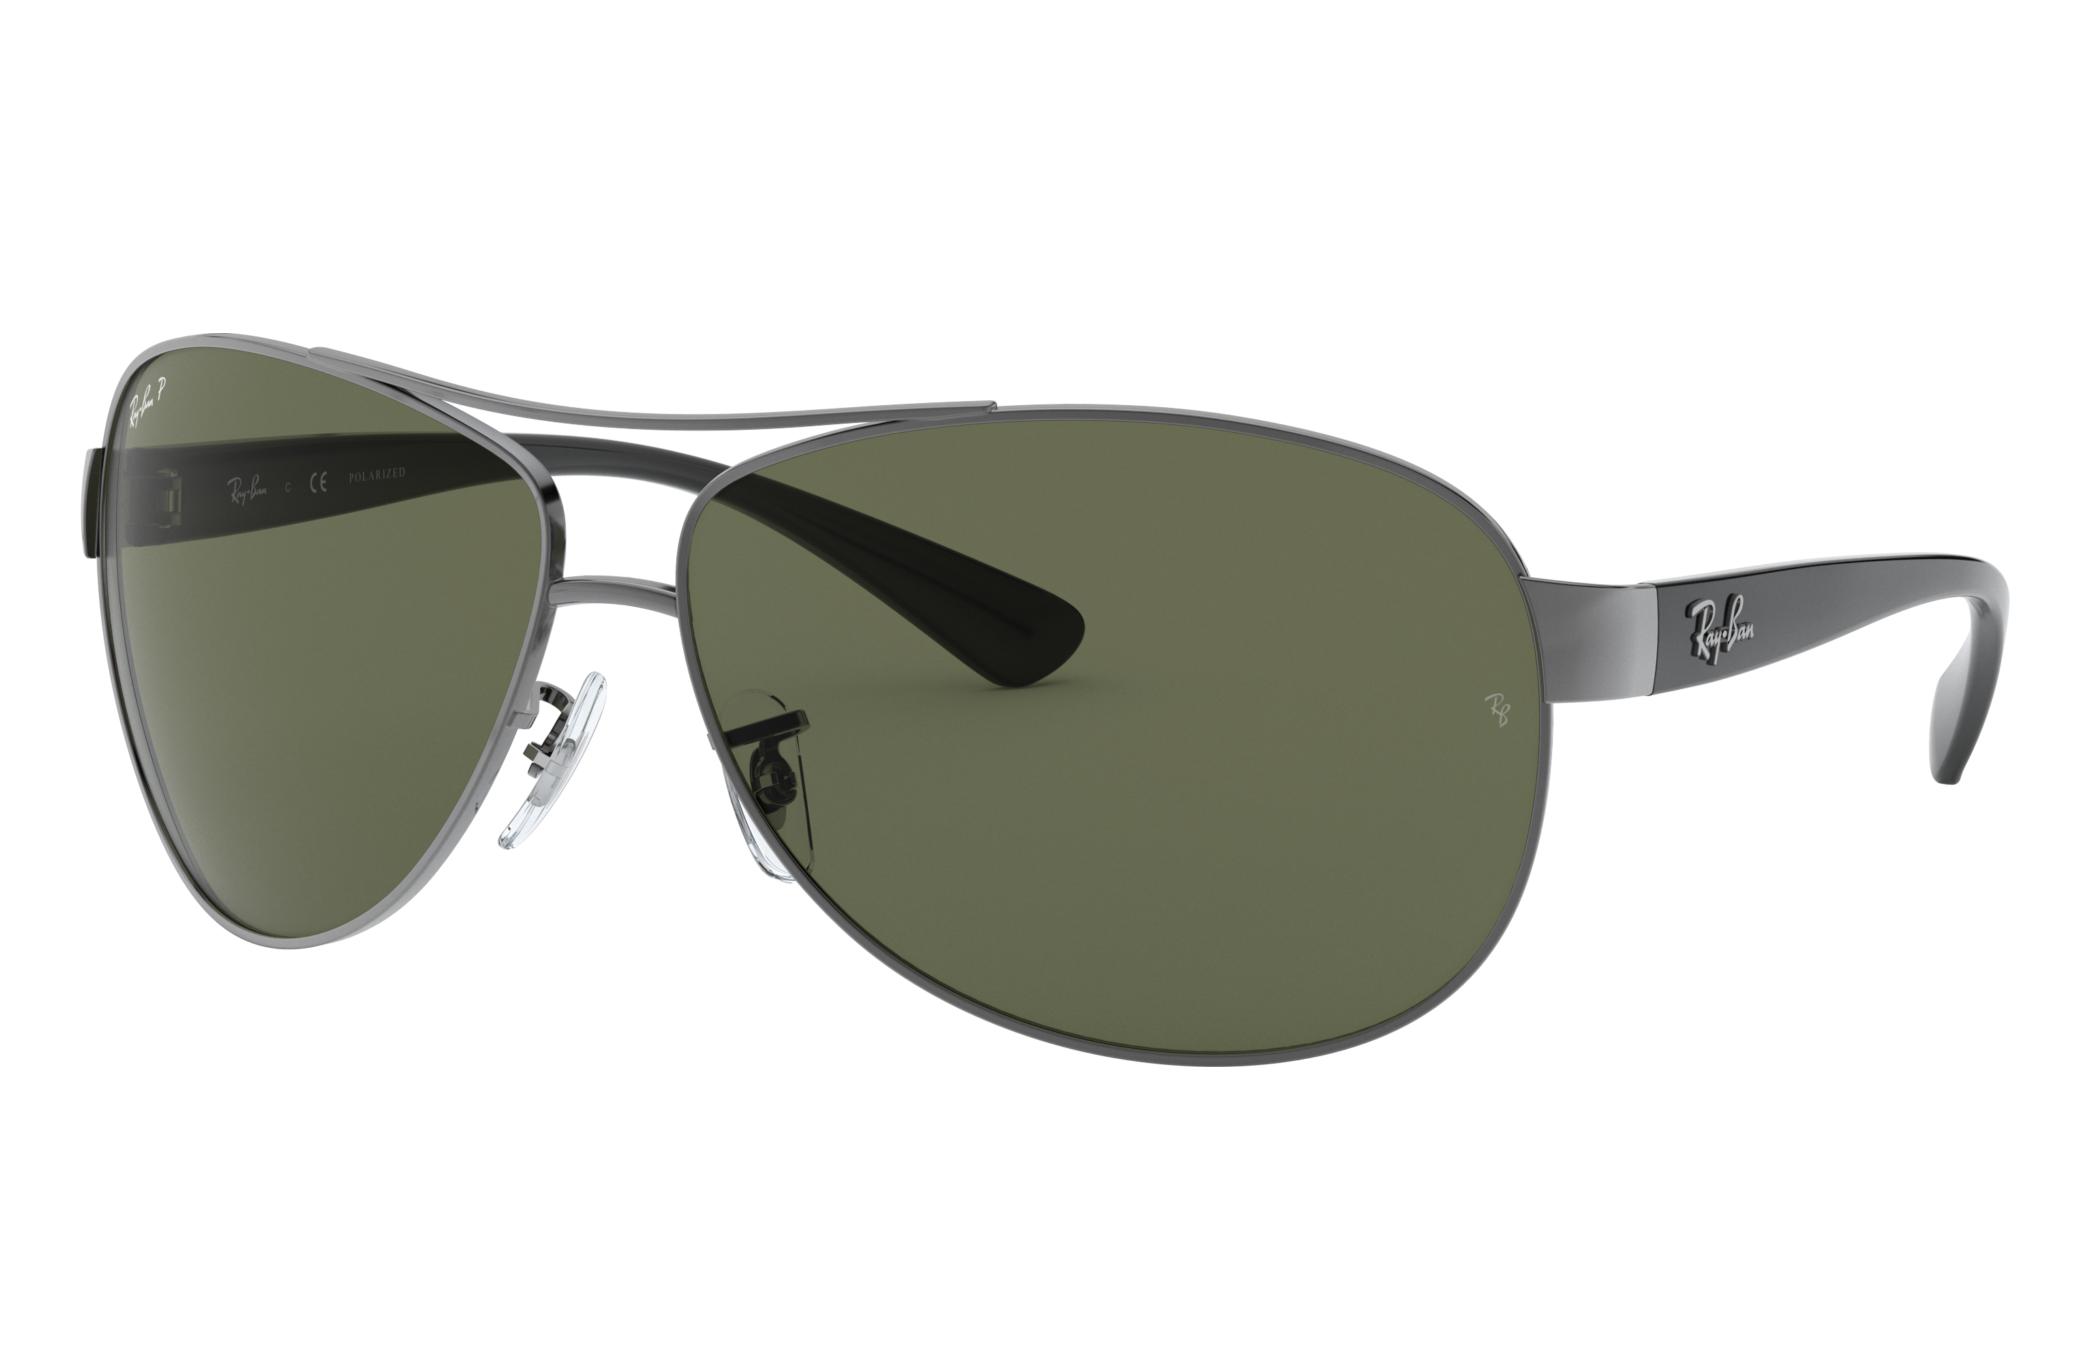 Ray-Ban Rb3386 Black, Polarized Green Lenses - RB3386